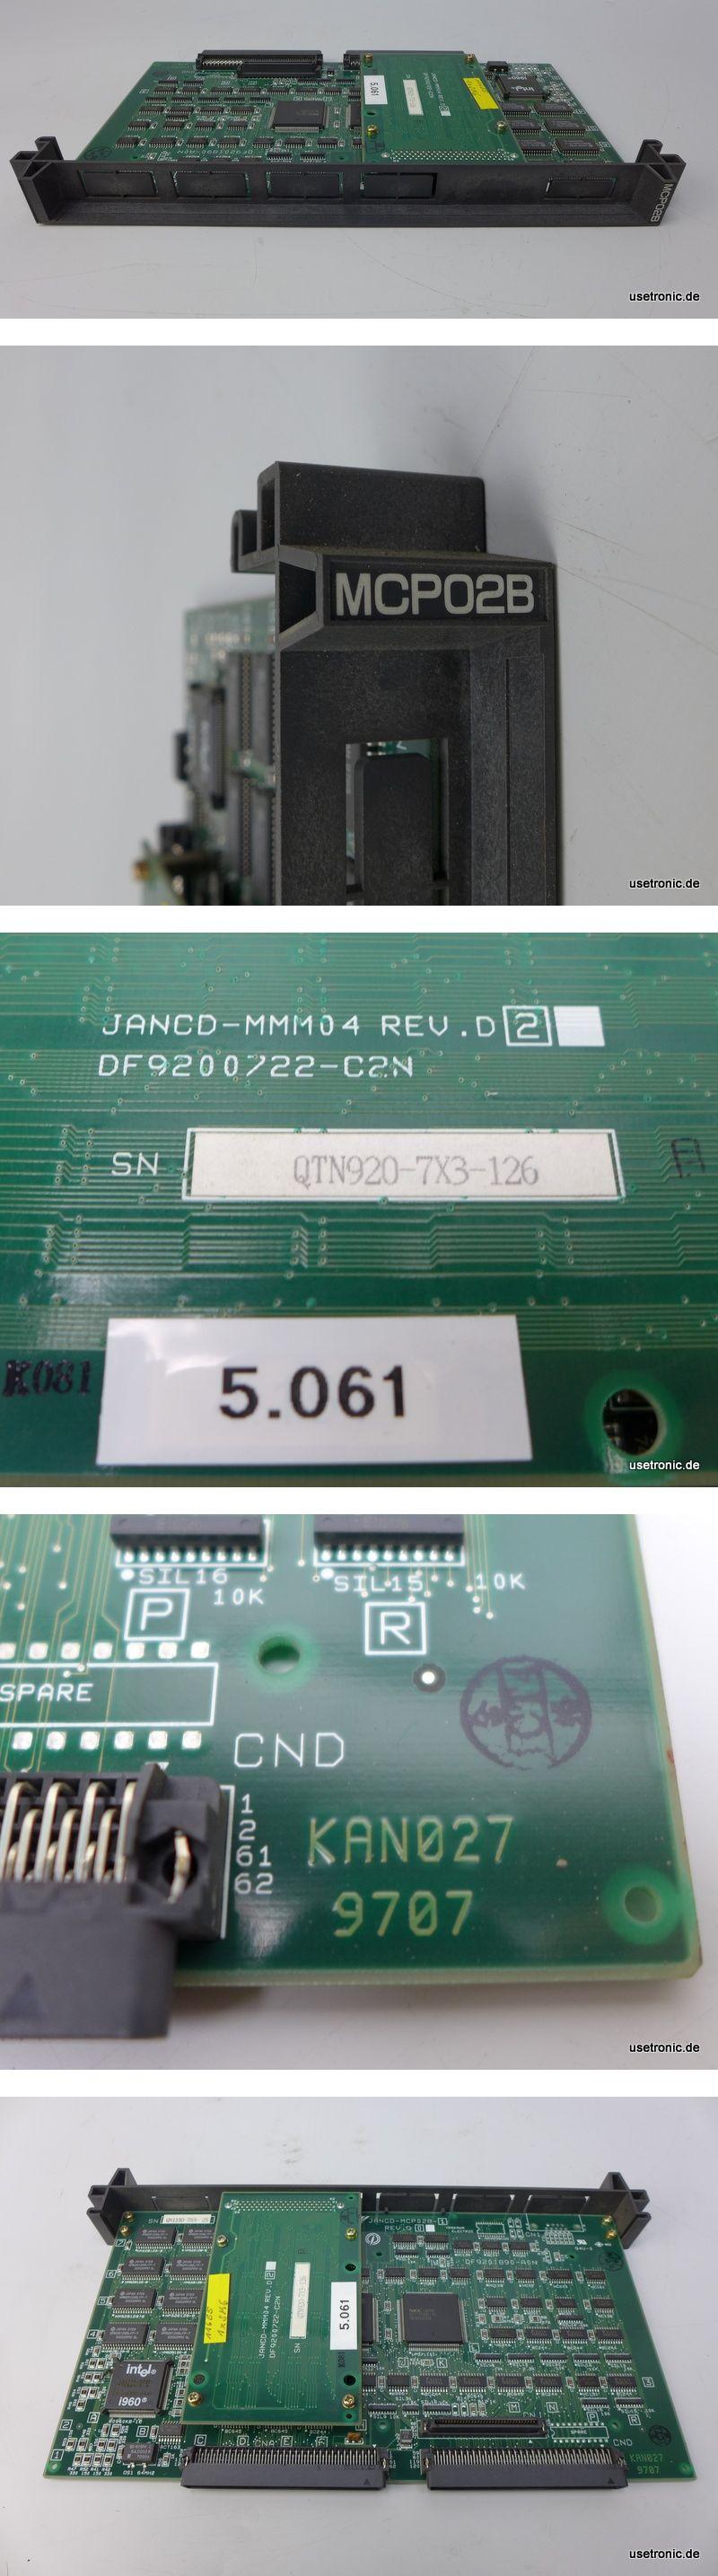 Yaskawa MCP02B JANCD-MMM04 REV.D2 DF9200722-C2N KAN027 9707